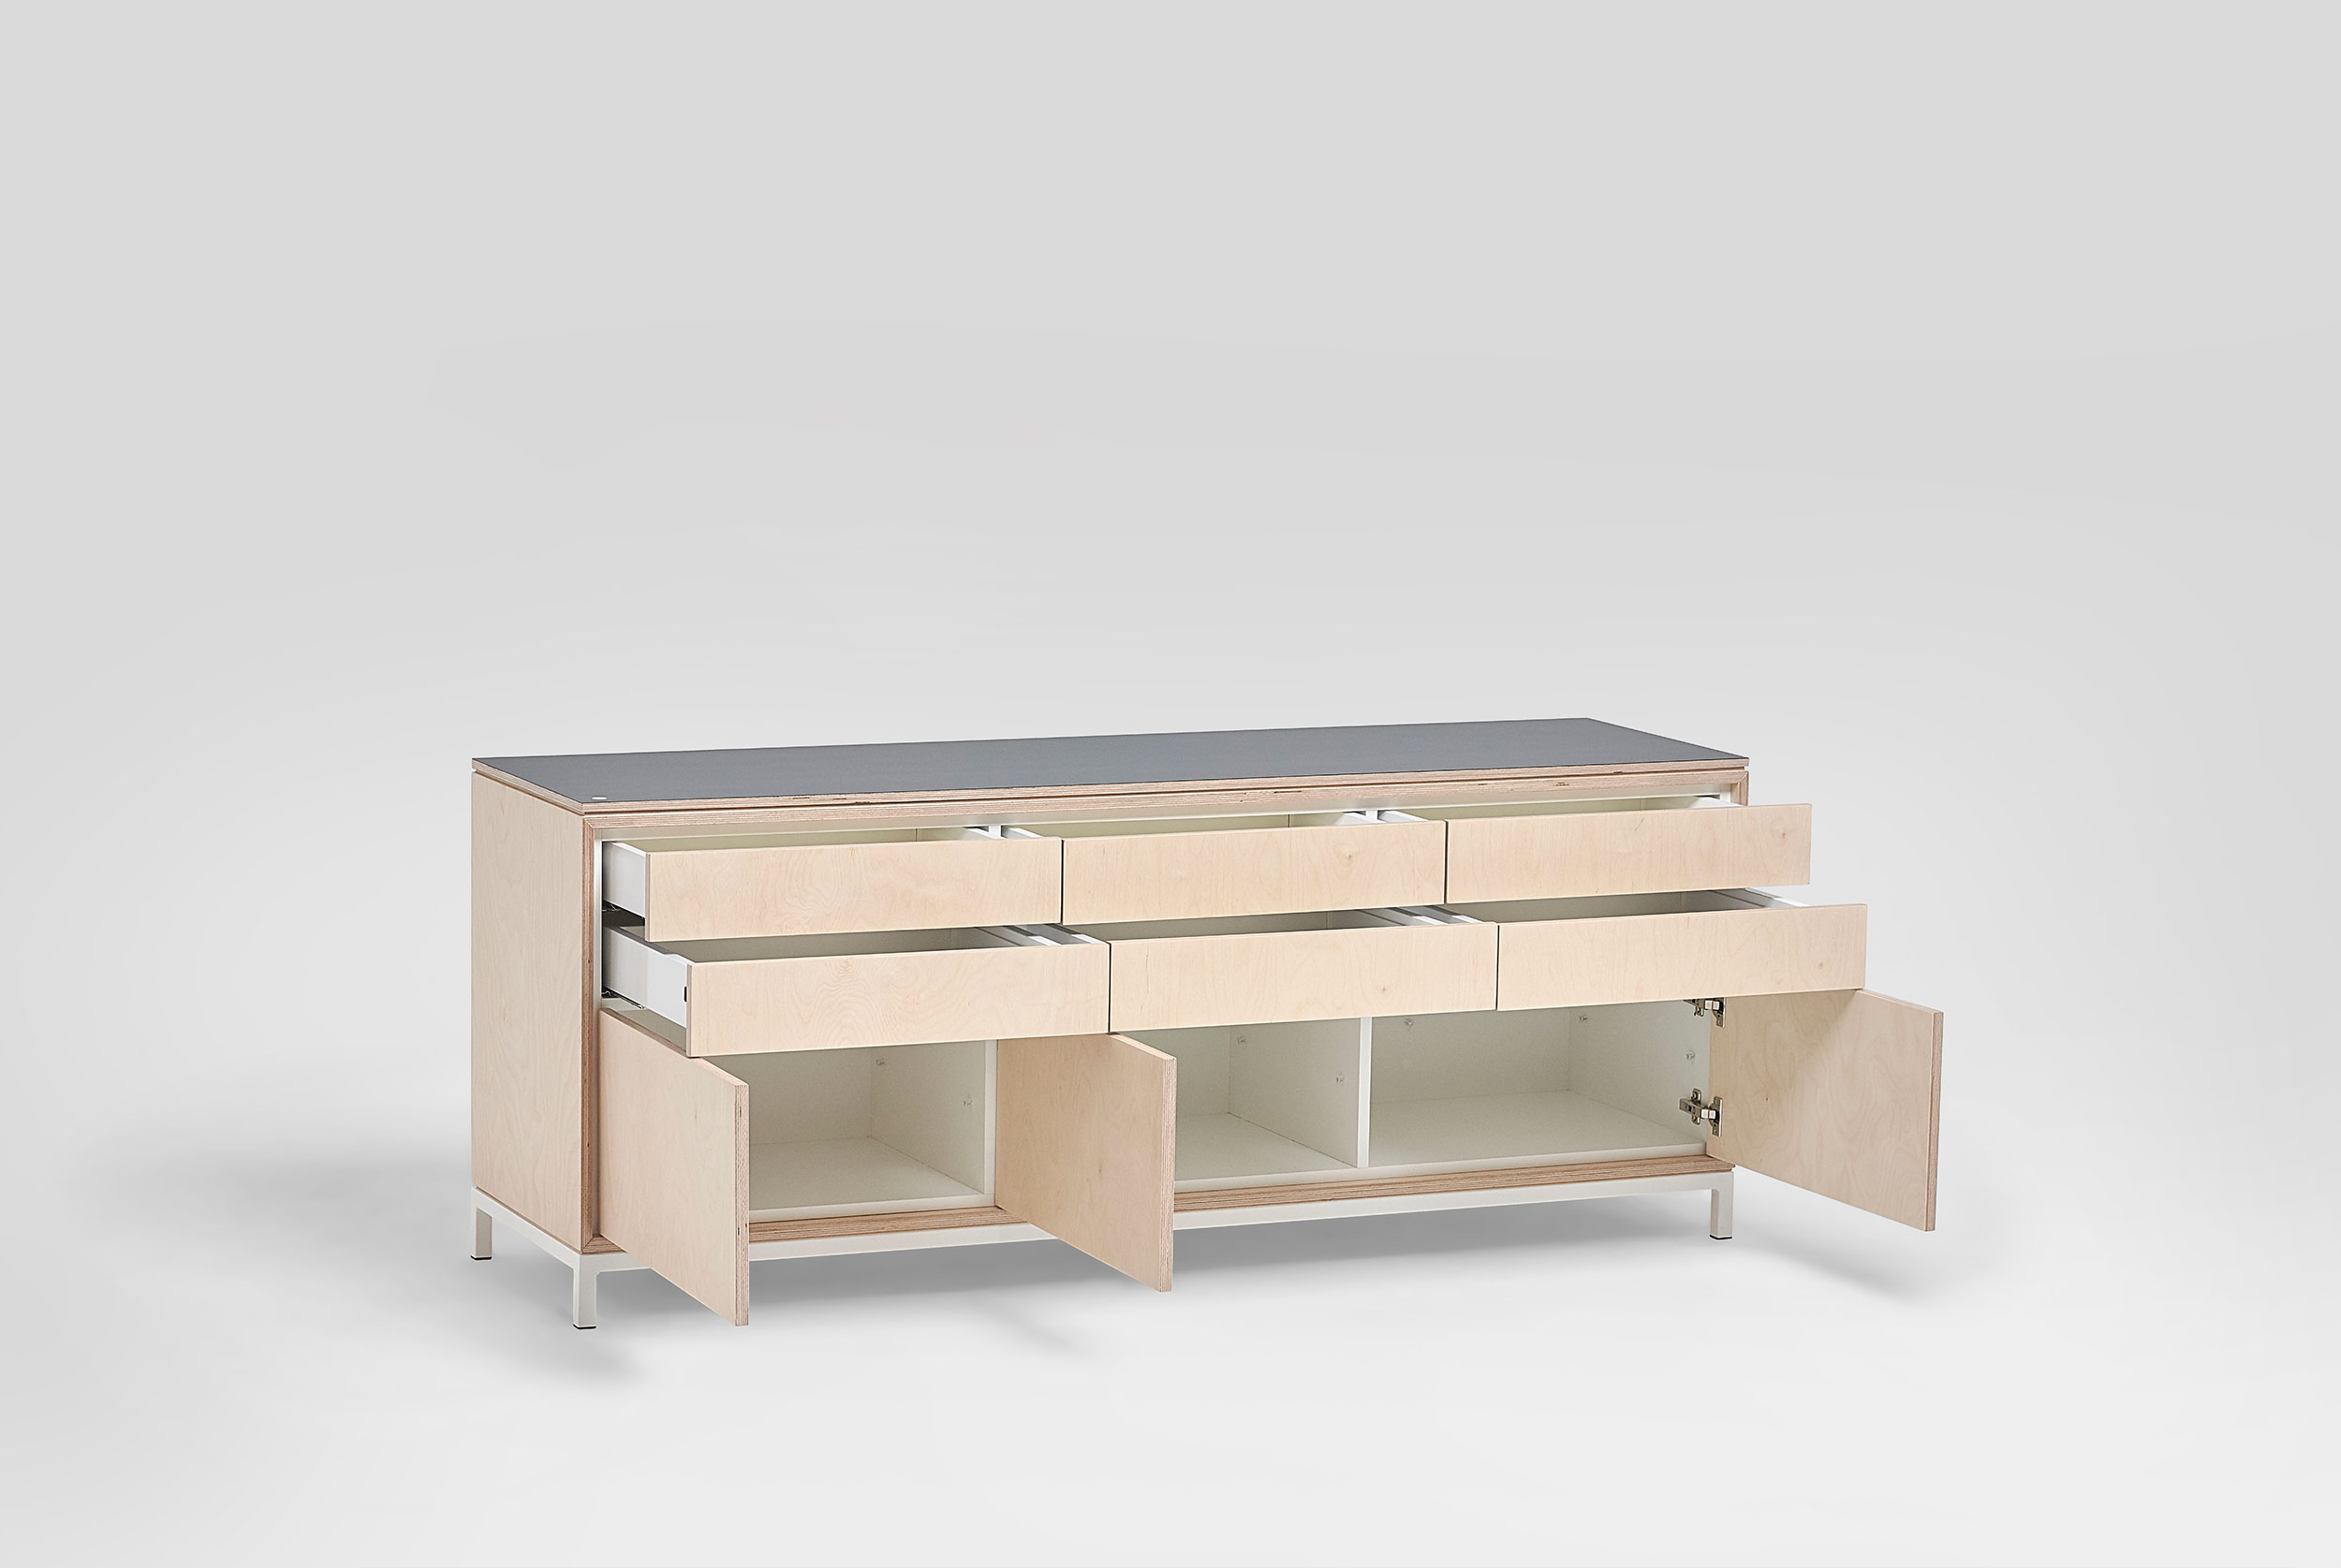 cuboid-credenza-drawers